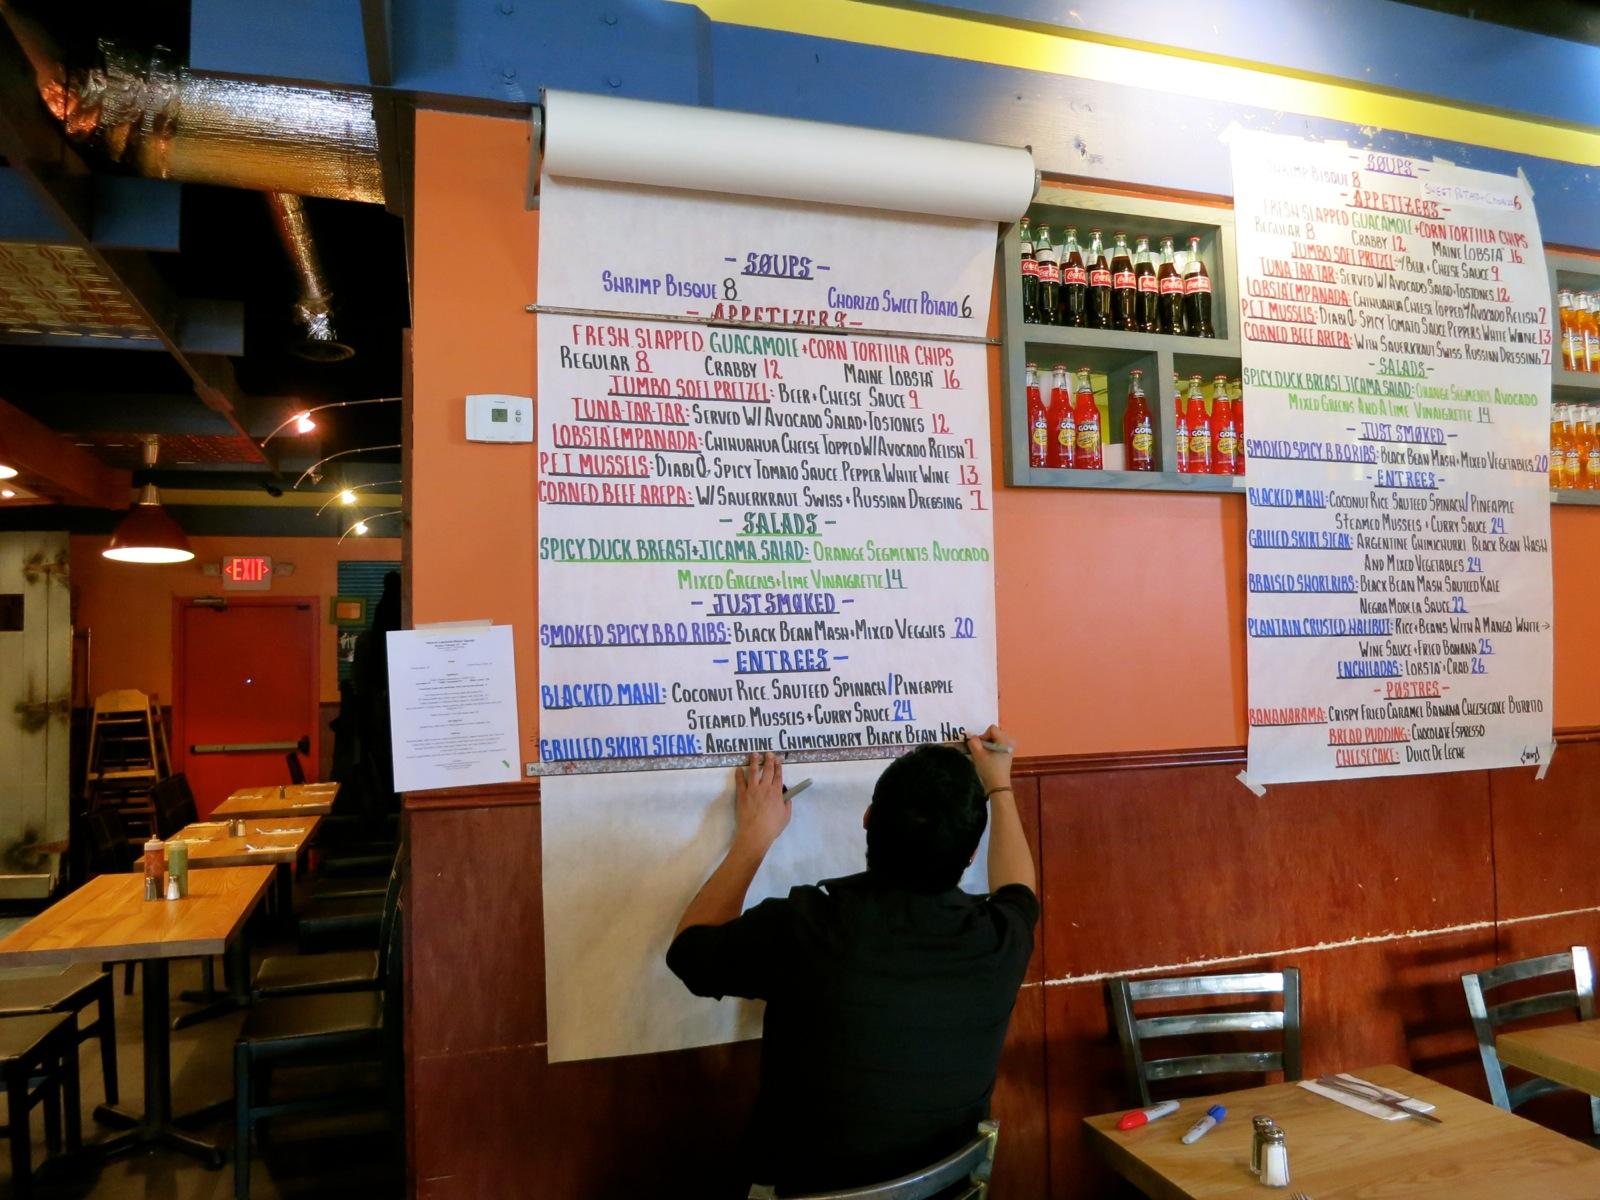 Valencia Restaurant Norwalk Ct Menu